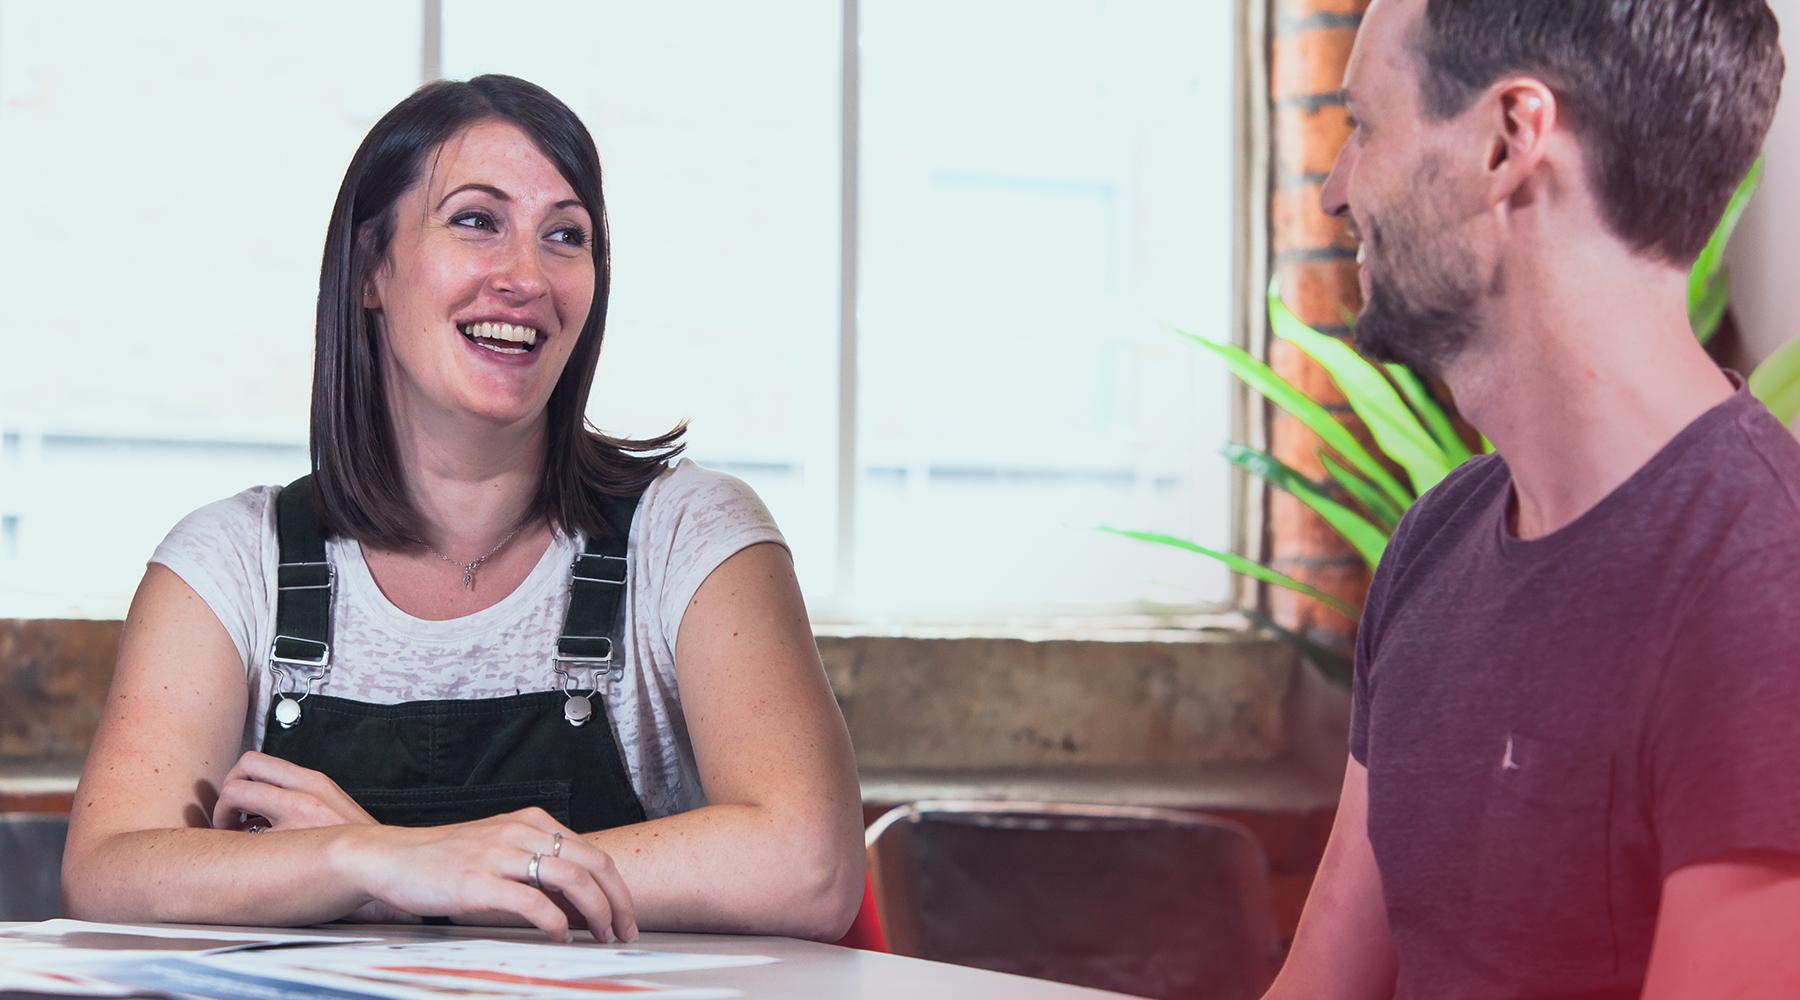 Christina Horton & Lucas Tomlinson in an internal meeting